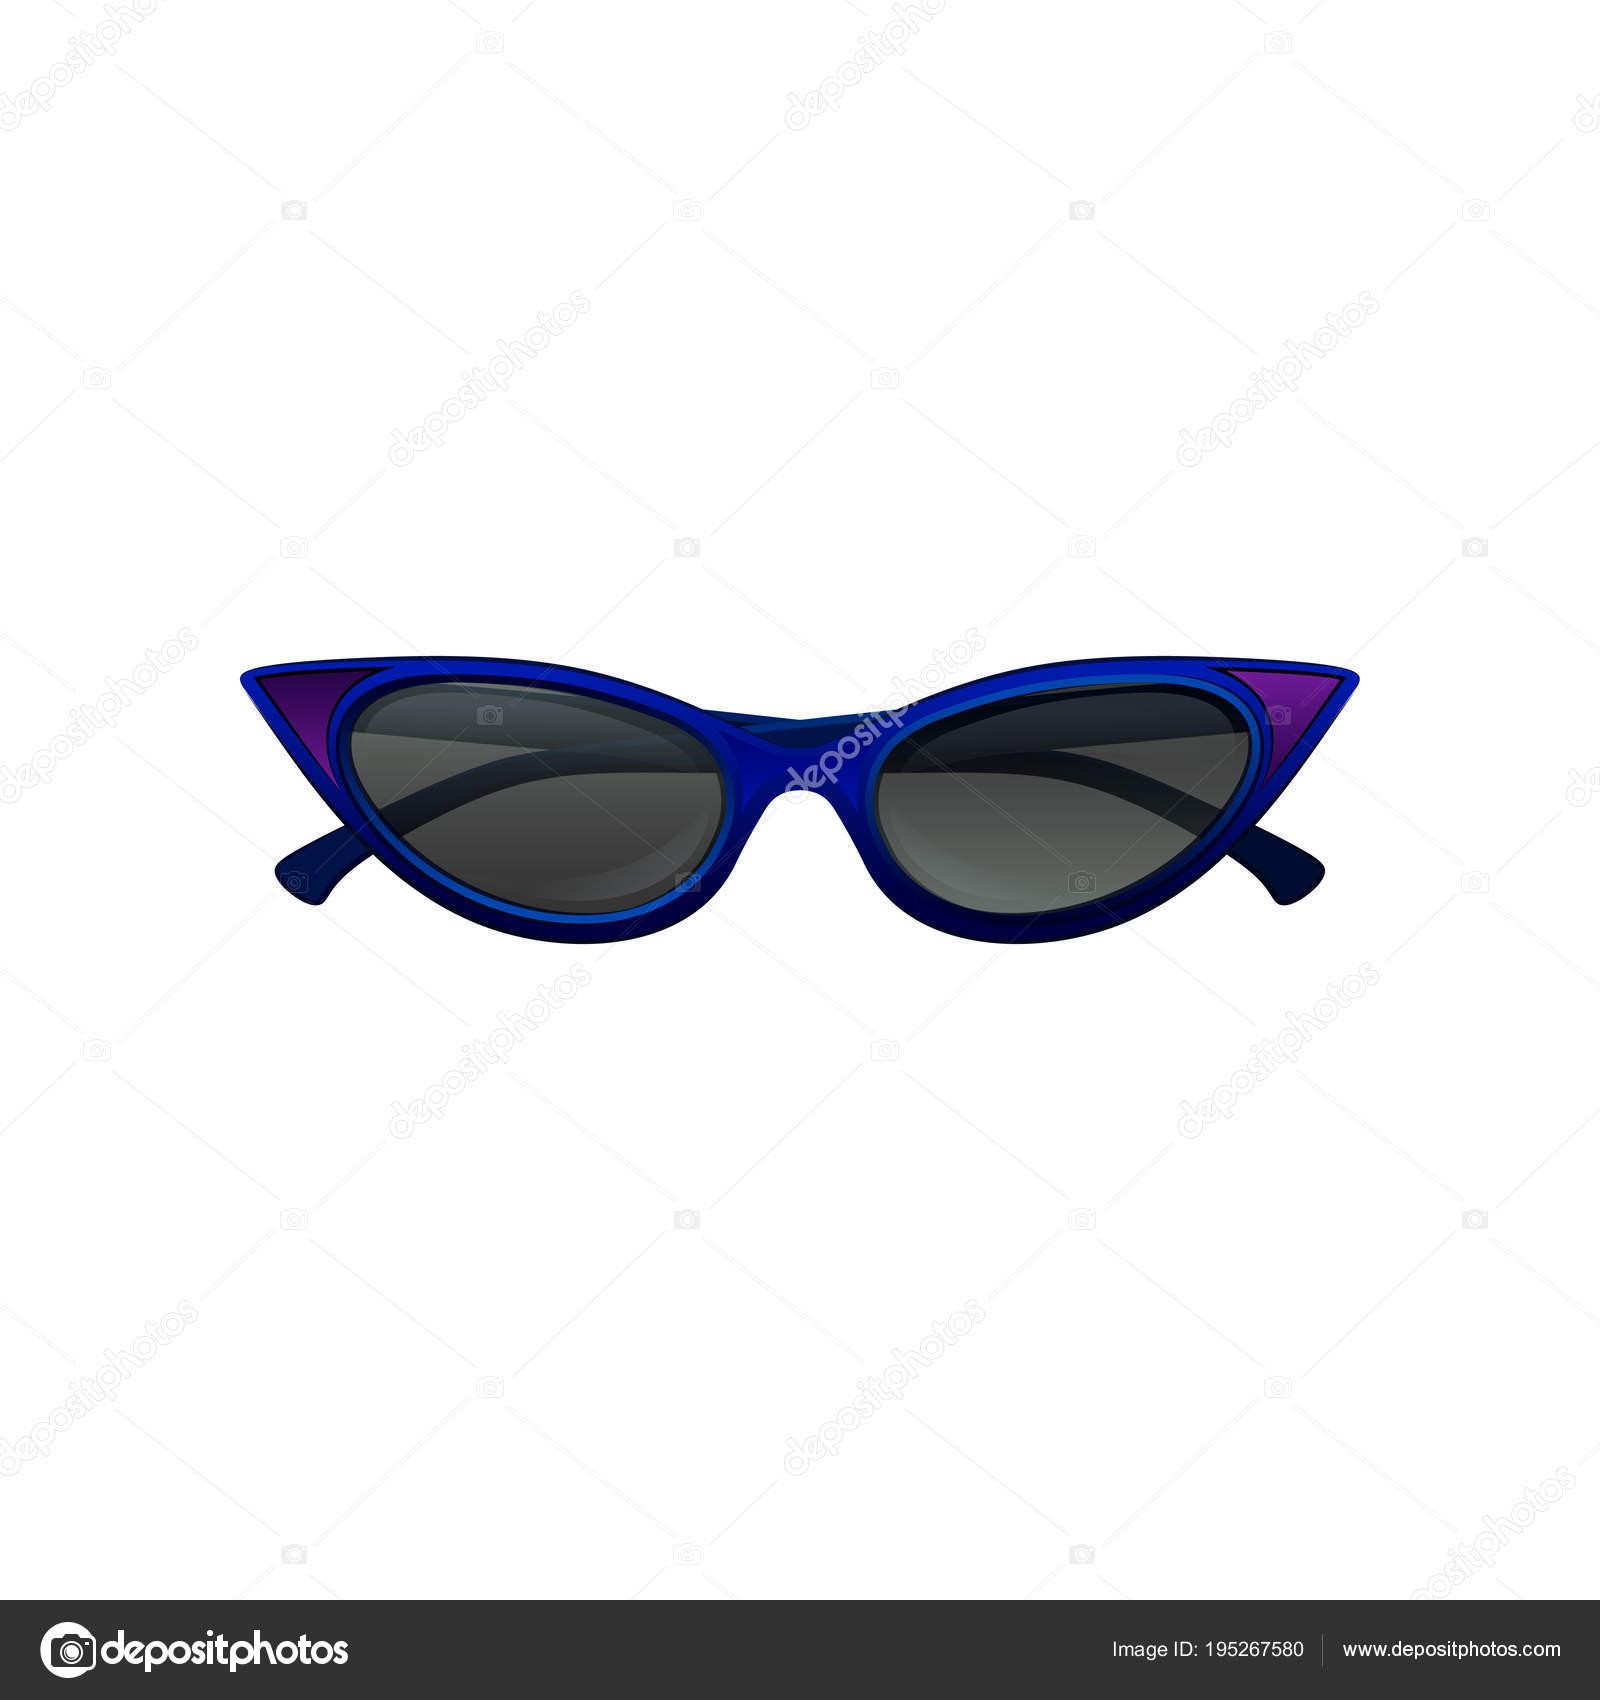 aec235101 depositphotos_195267580-stock-illustration-elegant-cat-eye-sunglasses-with.jpg